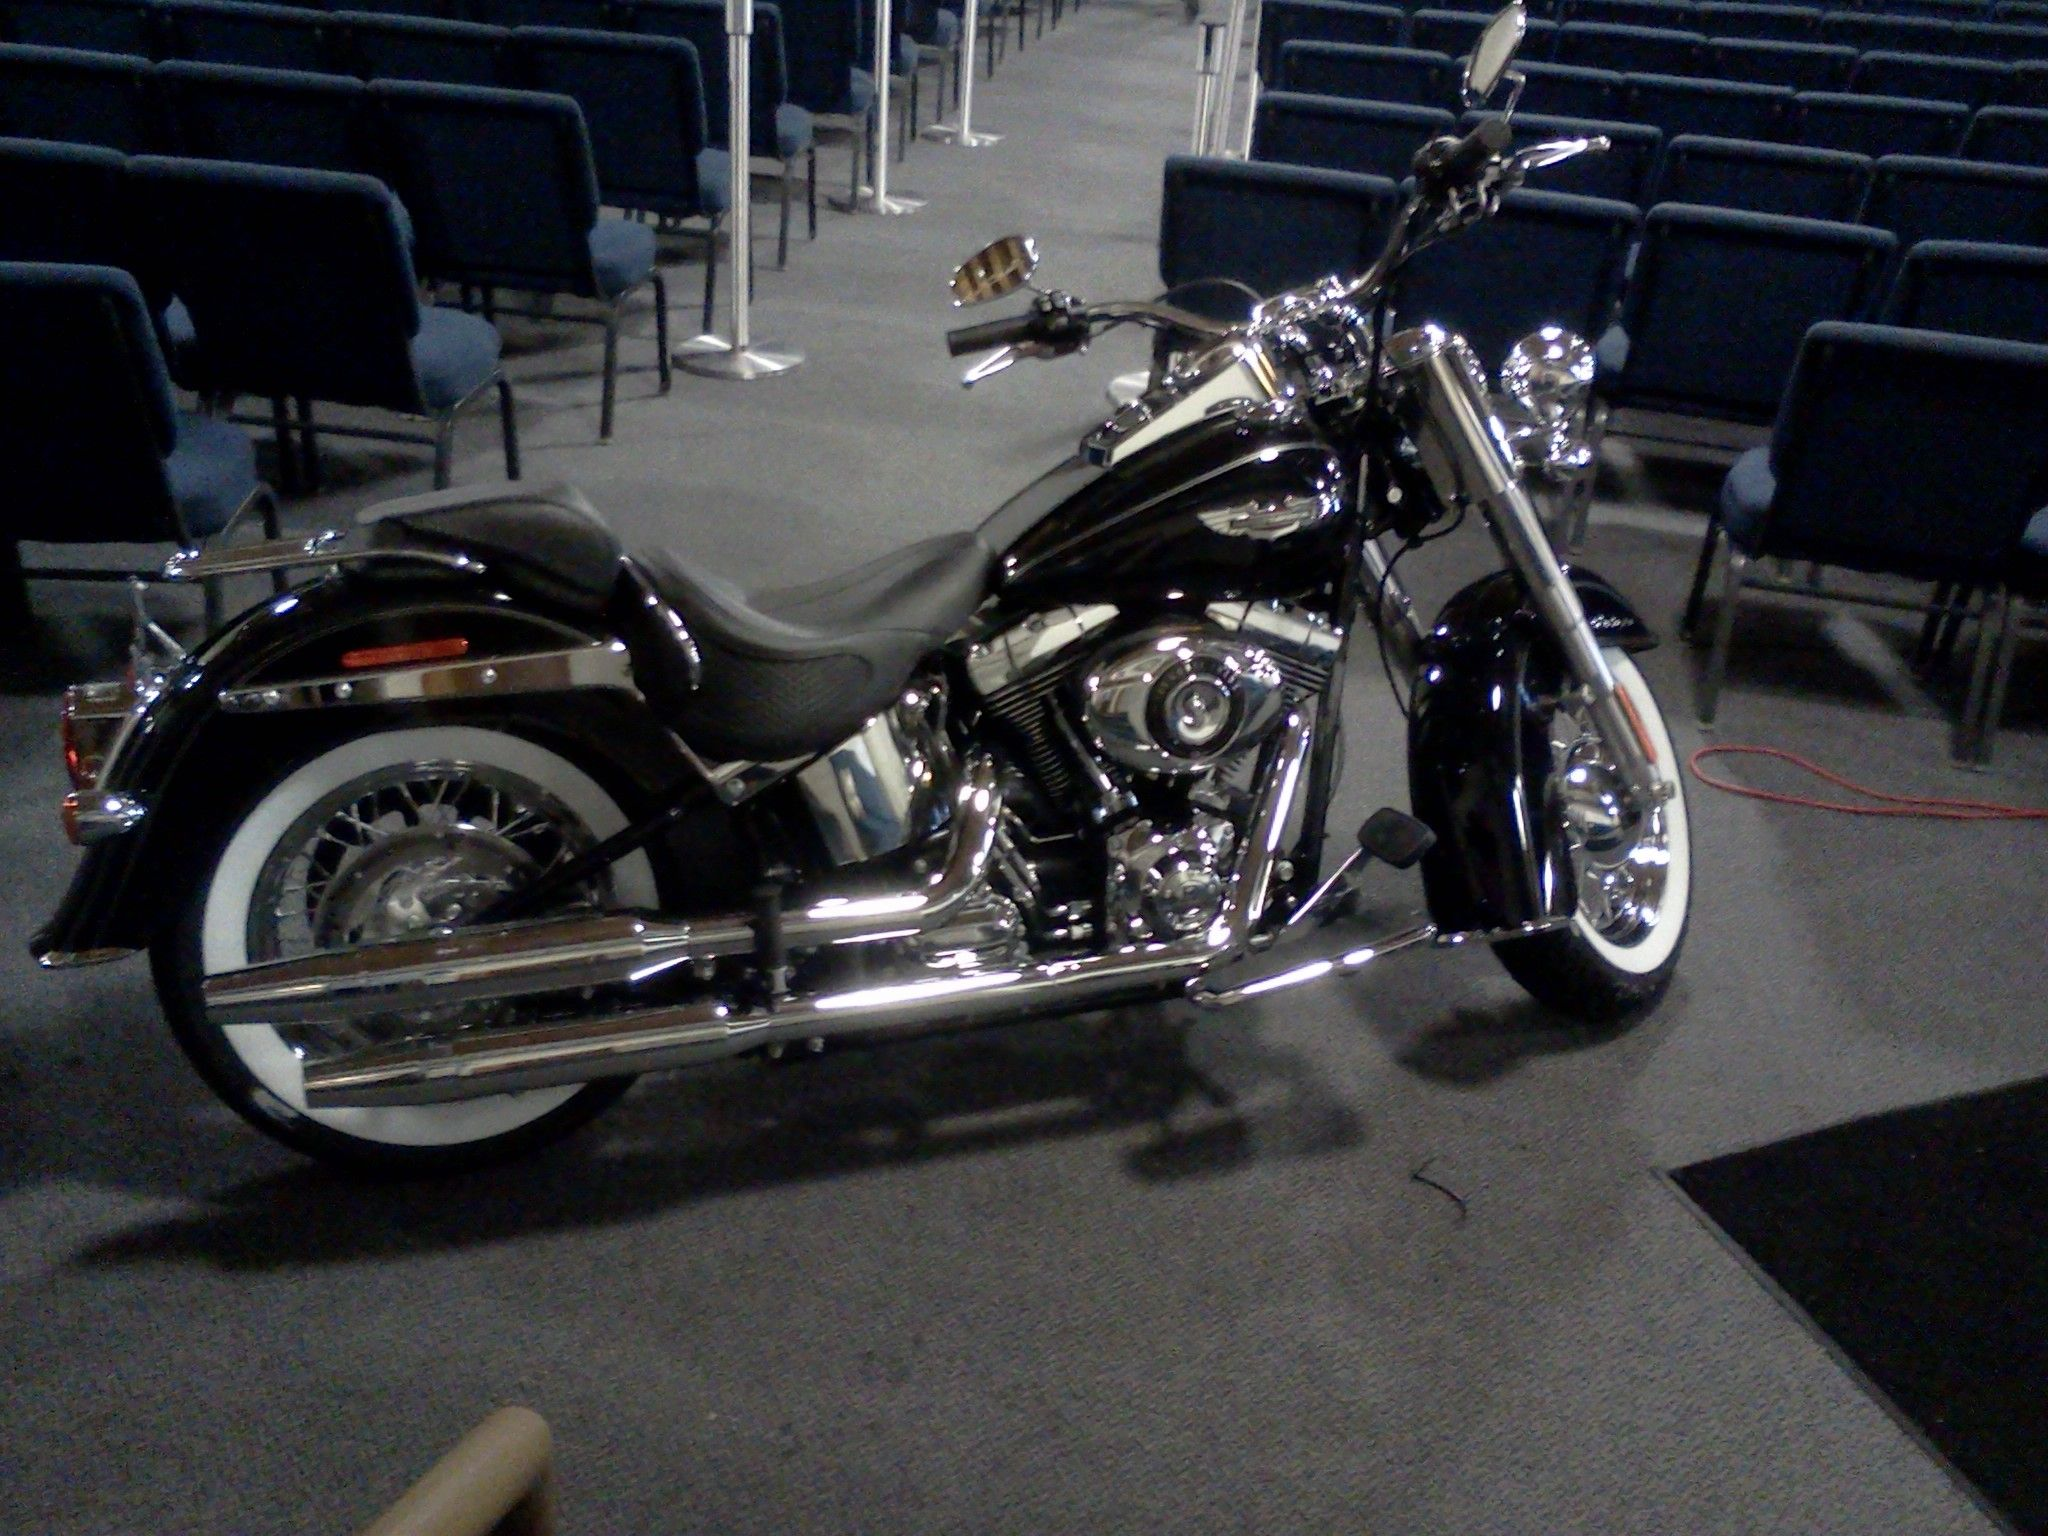 Harley Davidson Movie: Harley Davidson From Tyler Perry's Movie Good Deeds